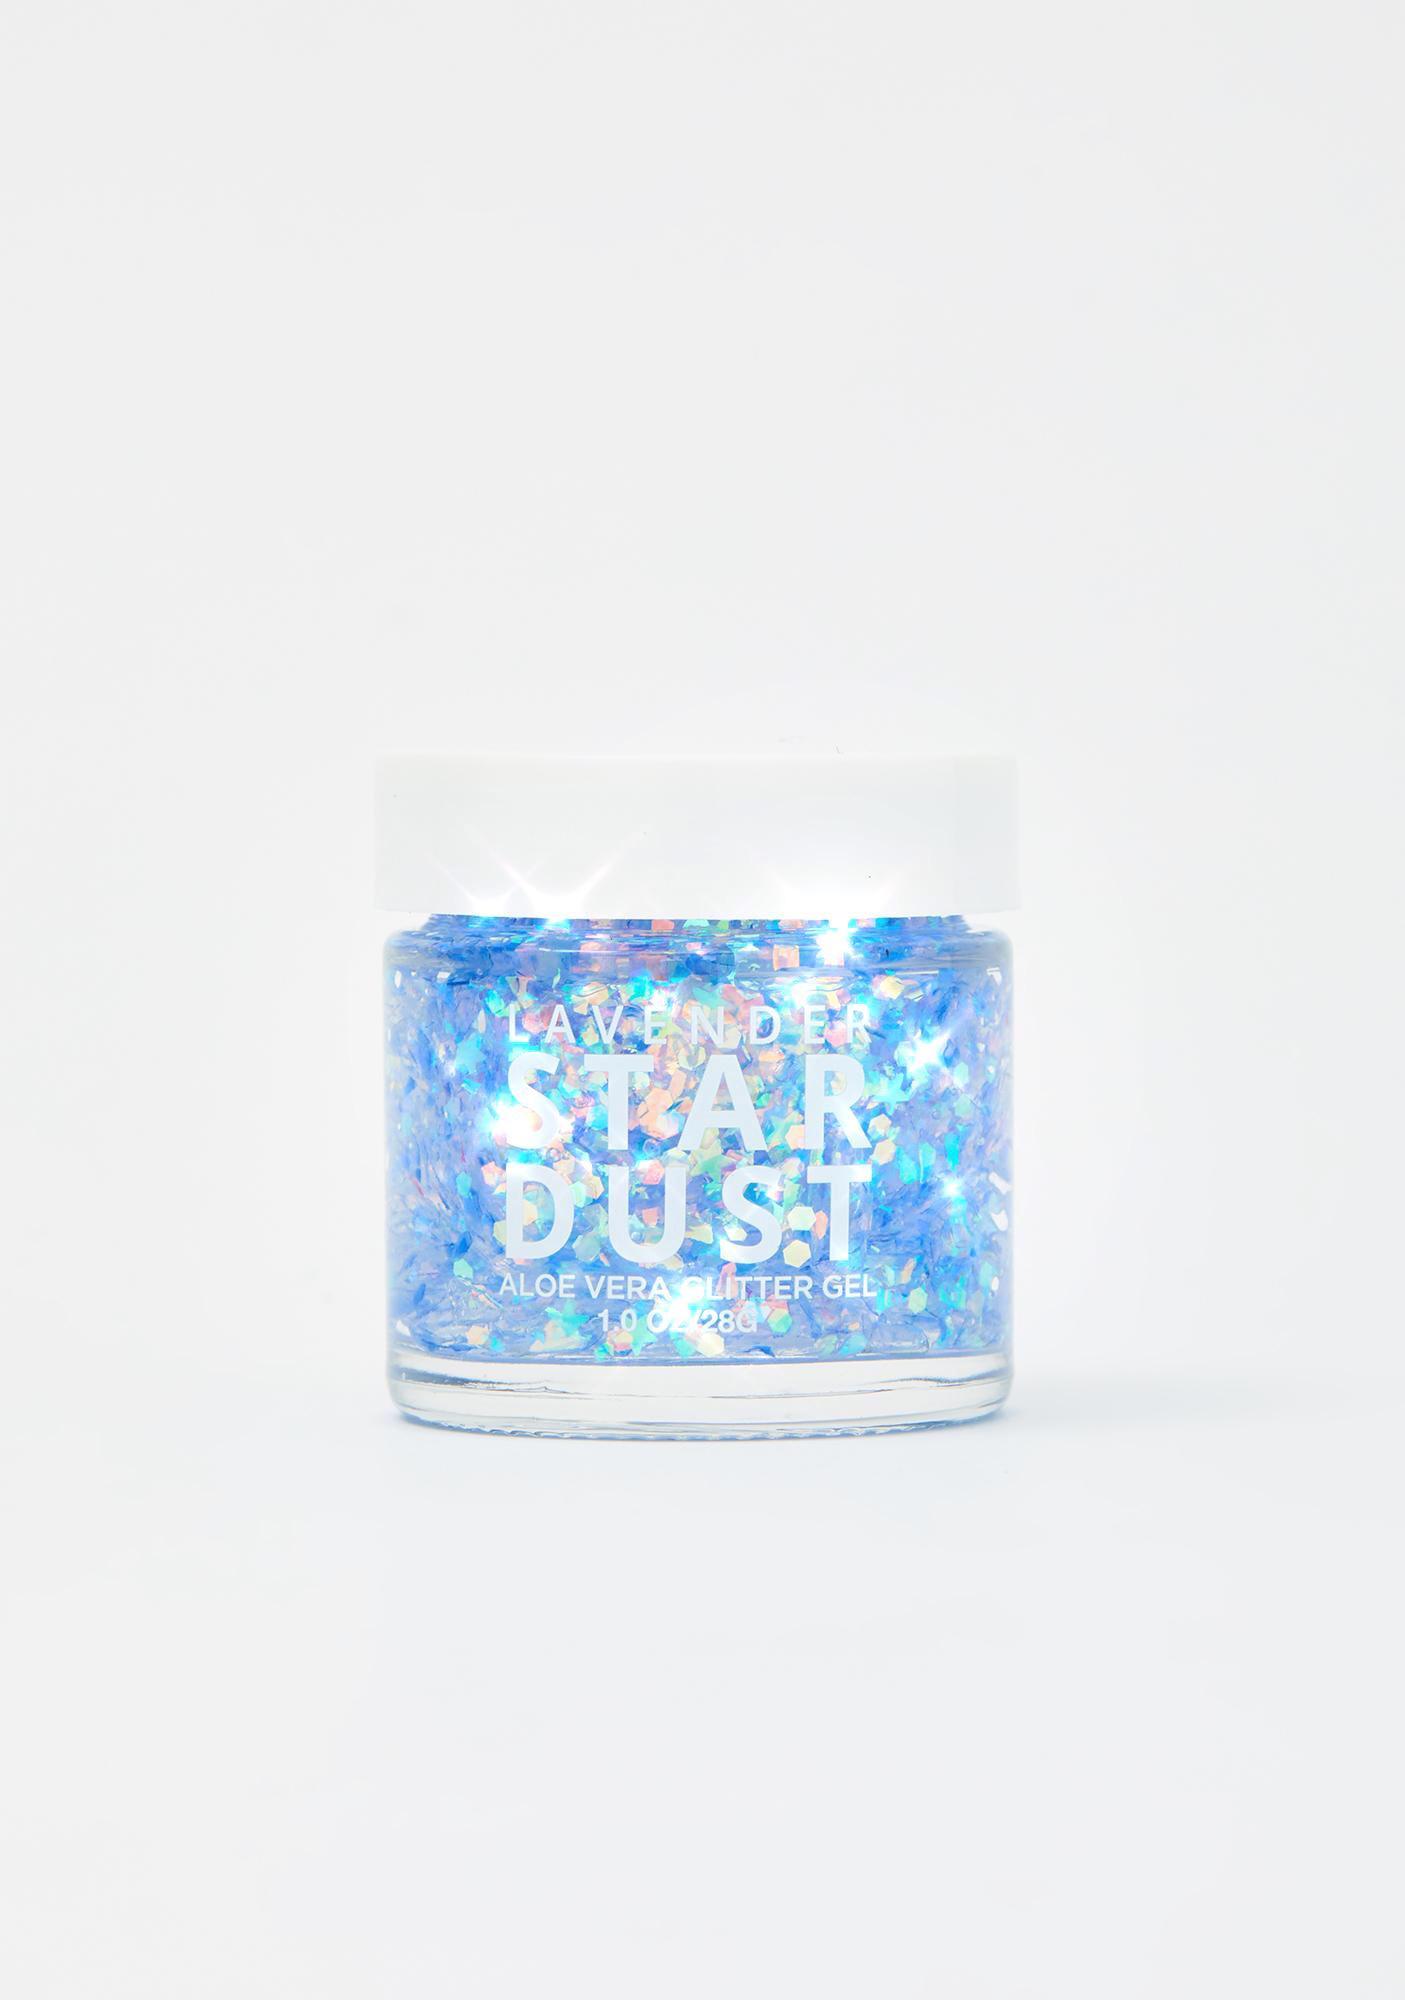 Lavender Stardust Moon Stardust Glitter Gel Pot